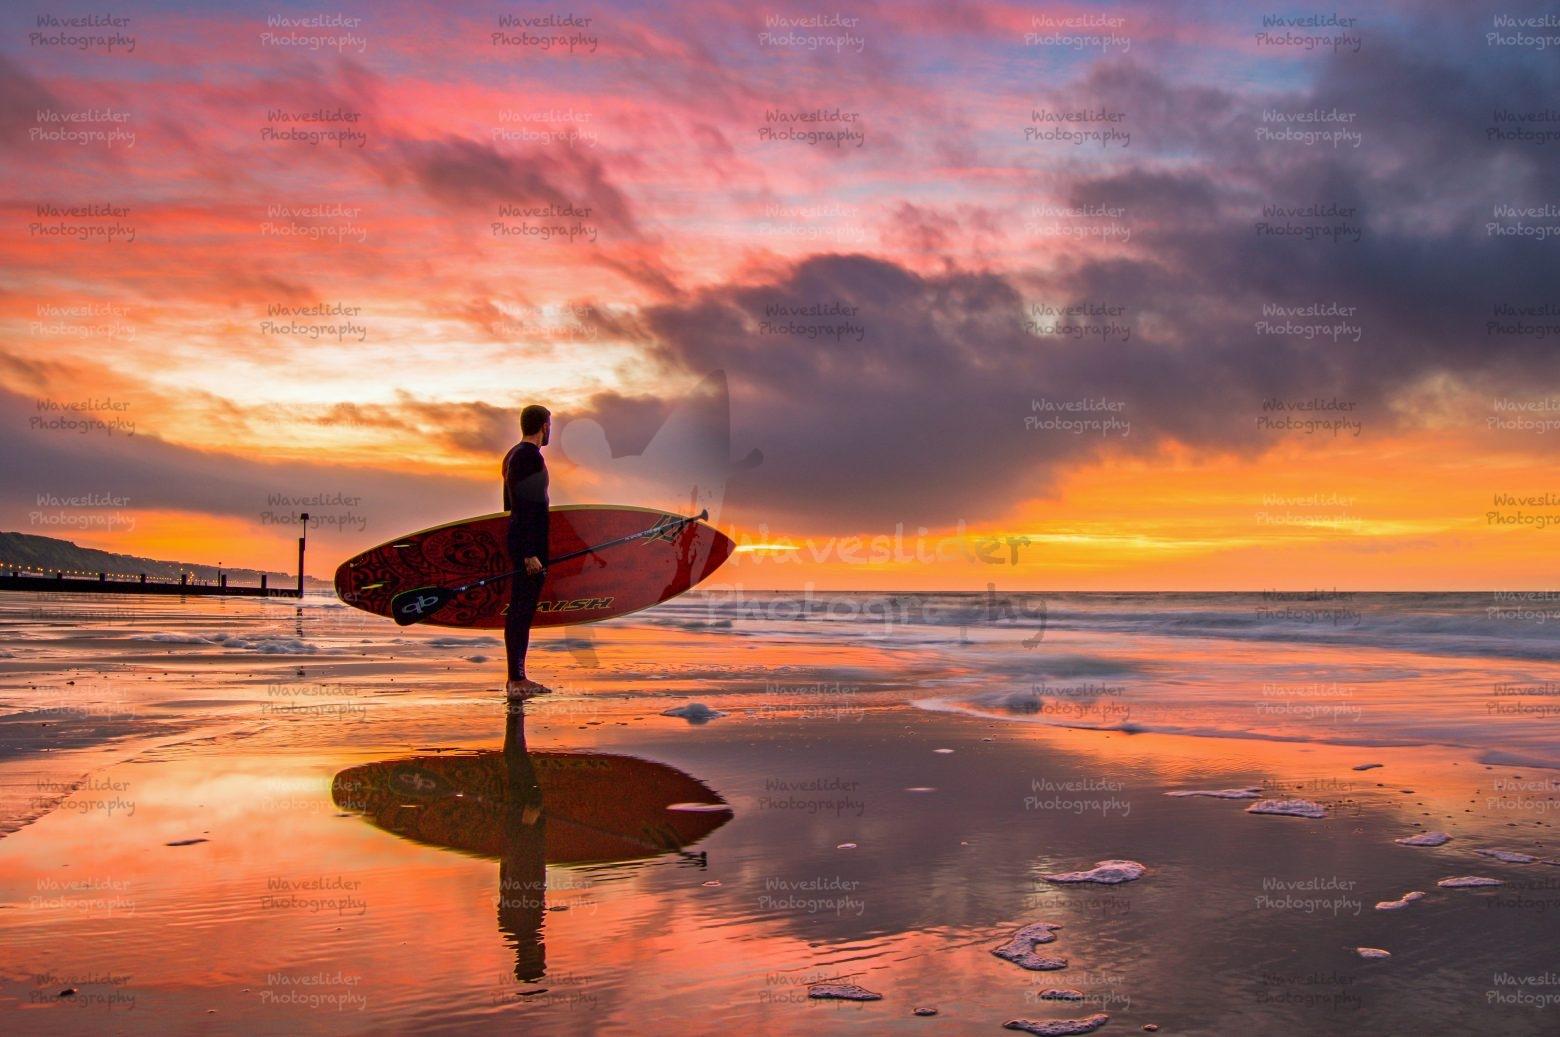 Boscombe Pier Sunrise – Waveslider Photography